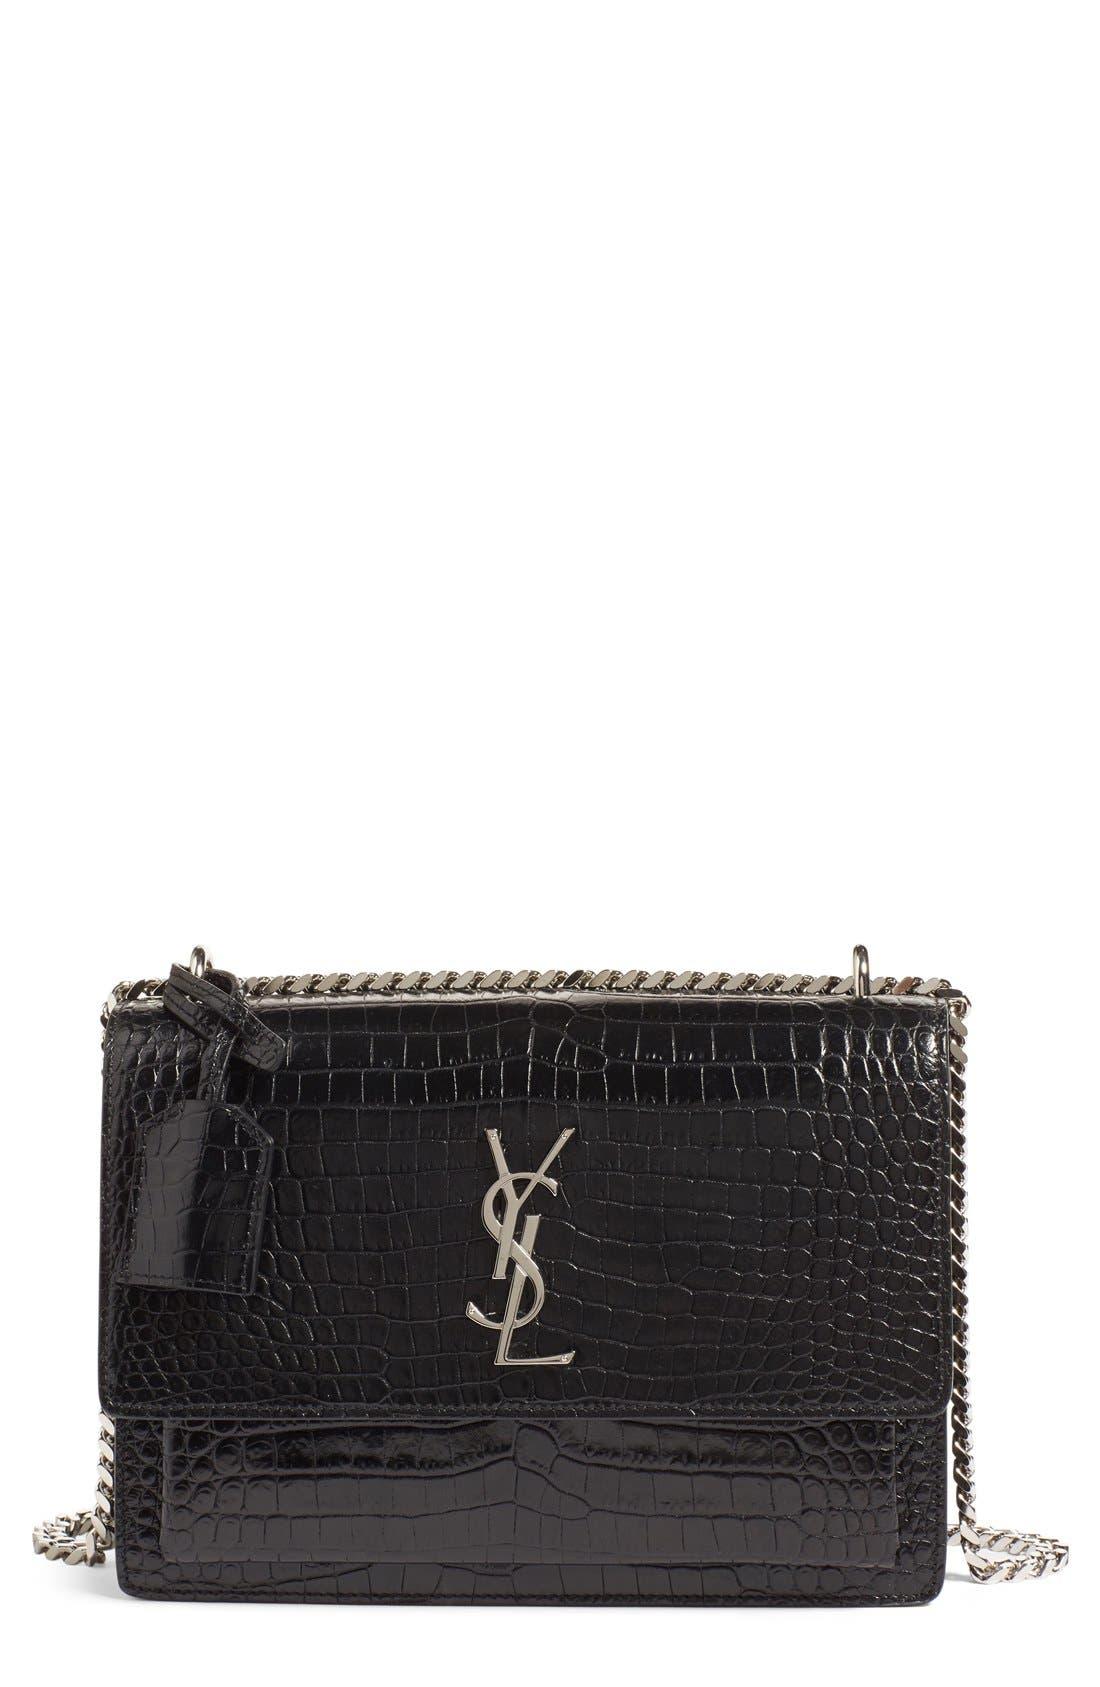 'Medium Monogram Sunset' Croc Embossed Leather Shoulder Bag,                         Main,                         color, Nero